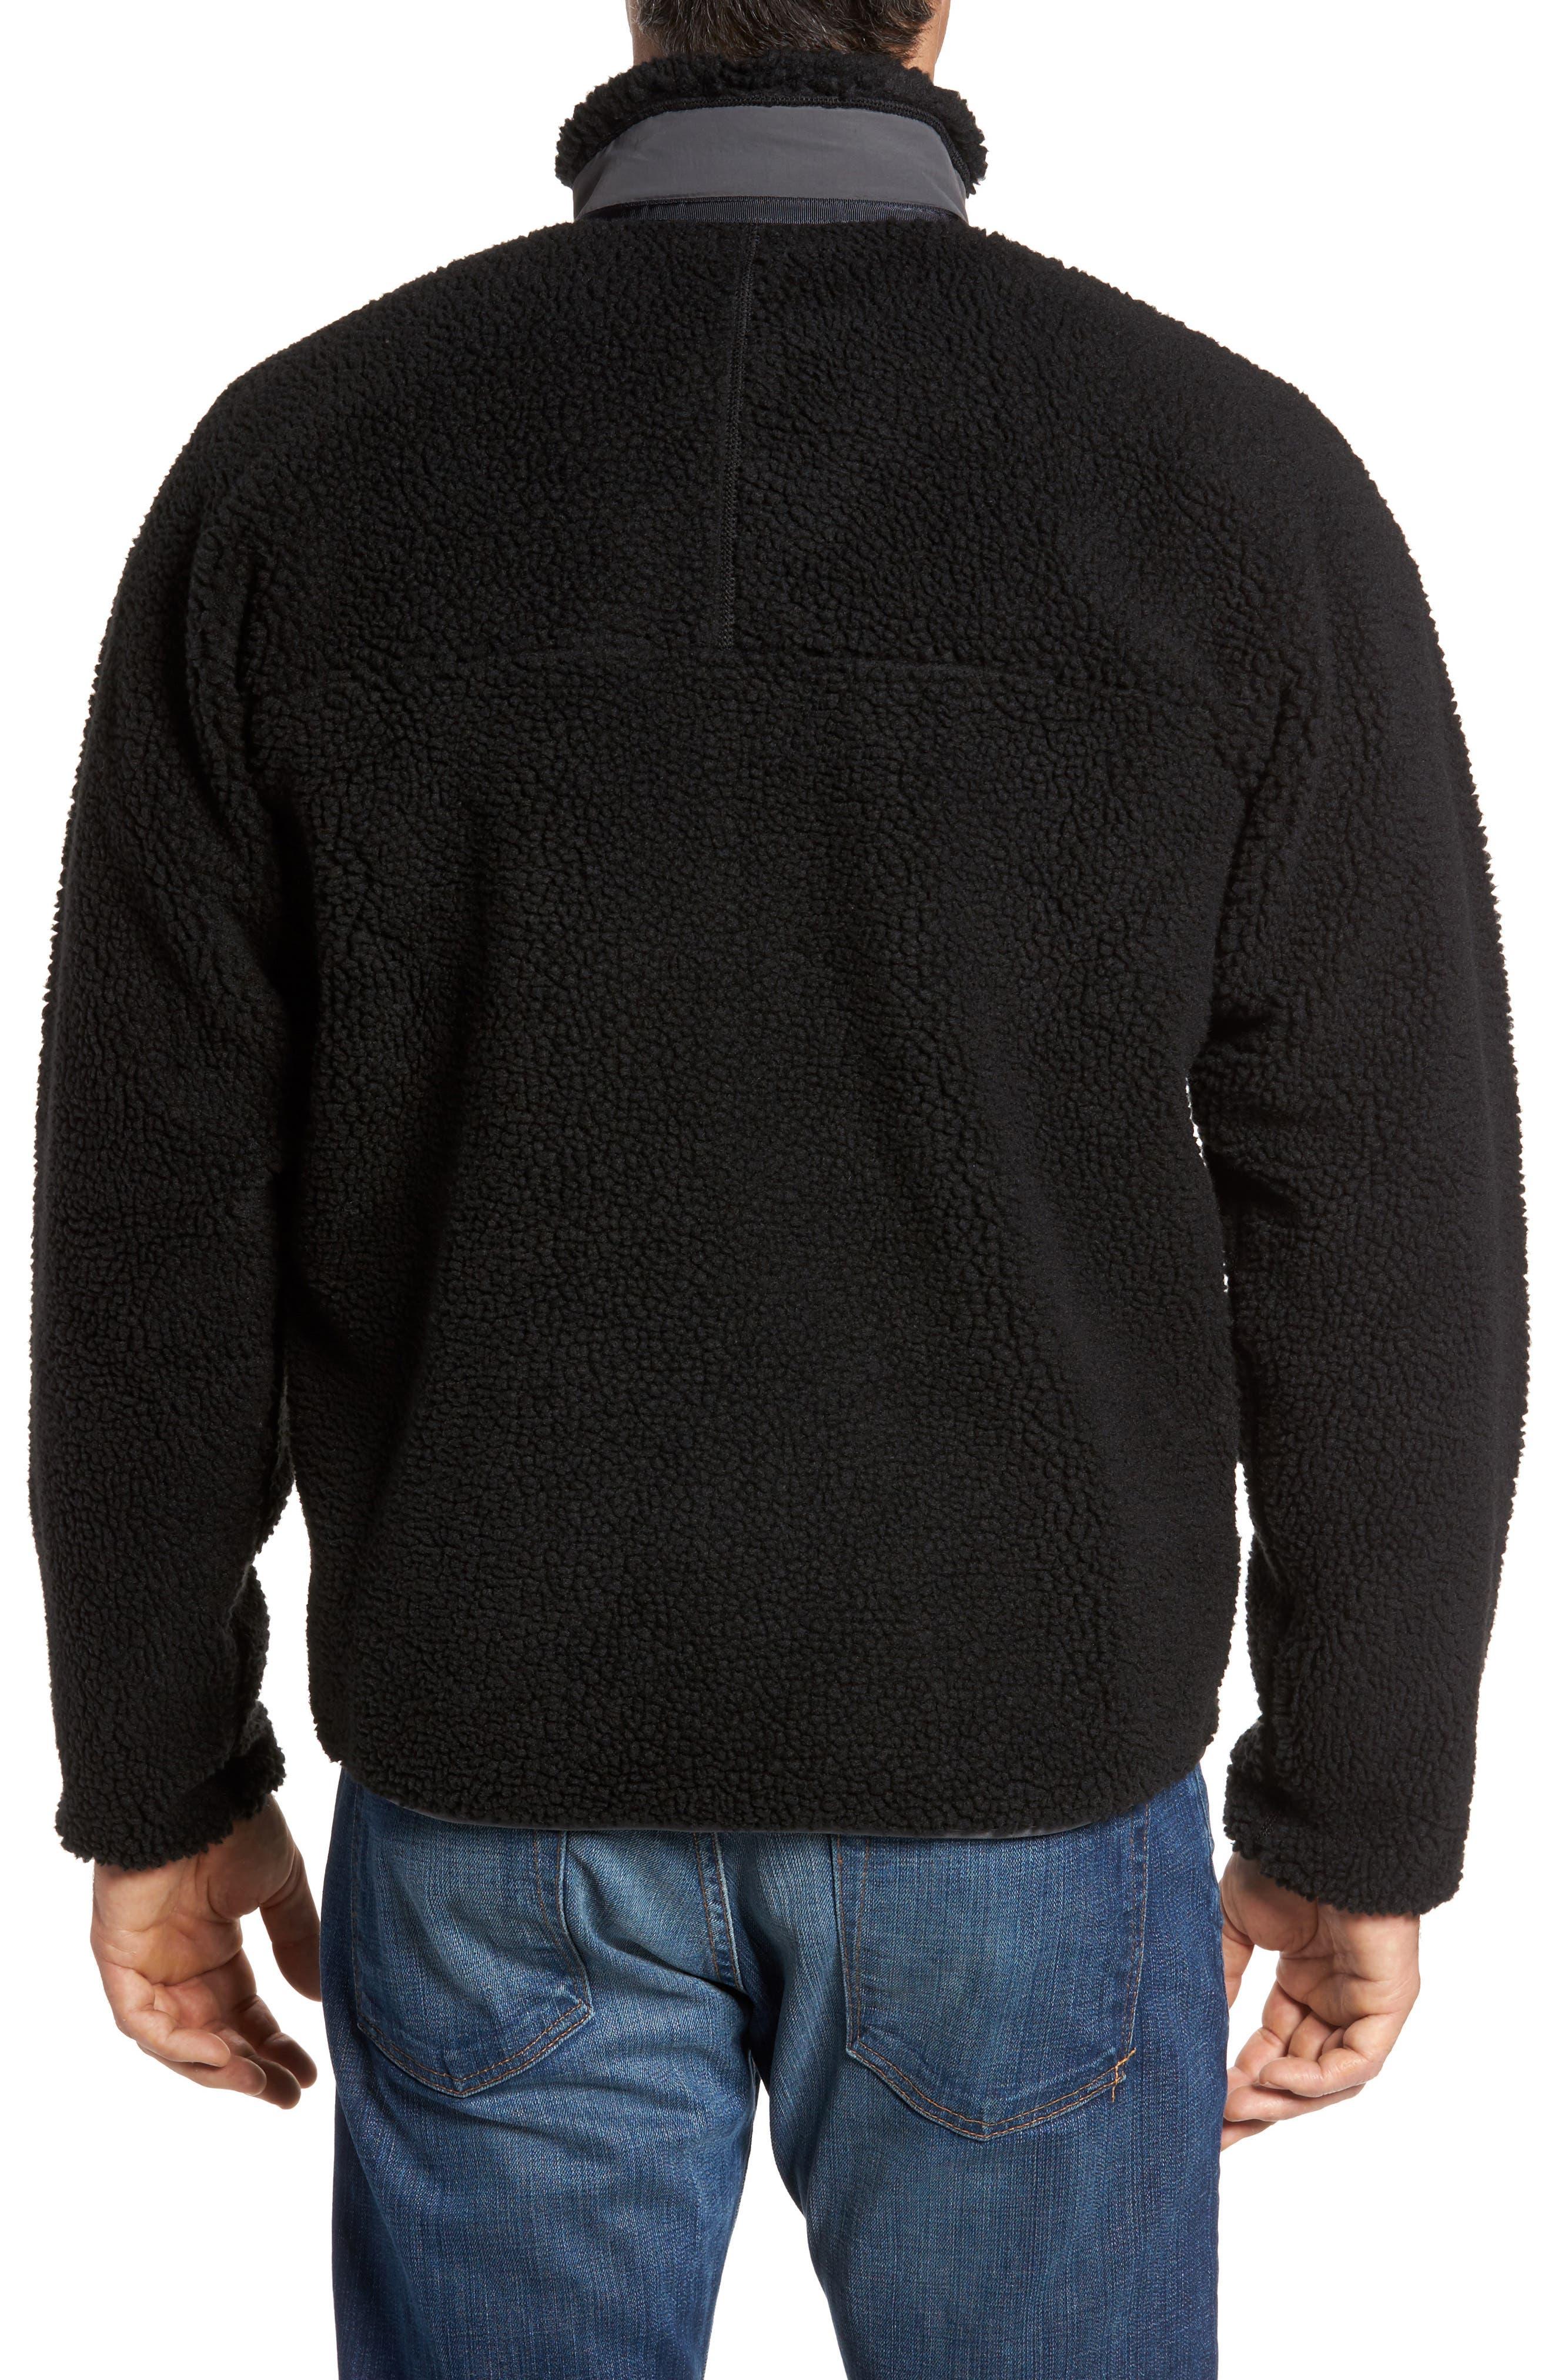 Retro-X Fleece Jacket,                             Alternate thumbnail 2, color,                             002